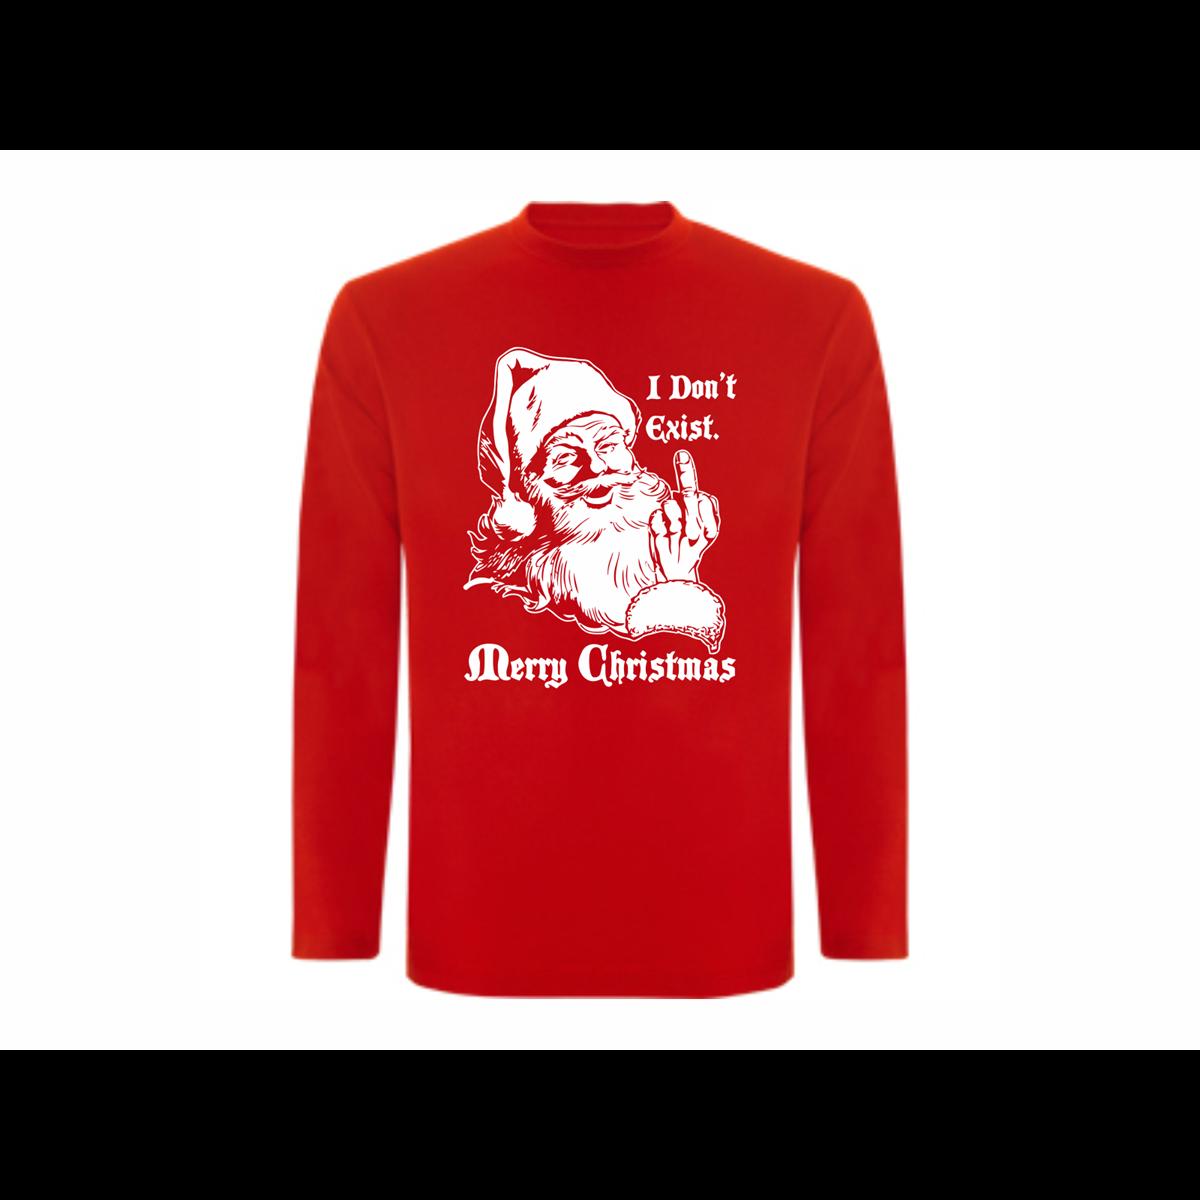 Stag do t shirt printing cheap fast quality fun stag do t for Cheap quick t shirt printing